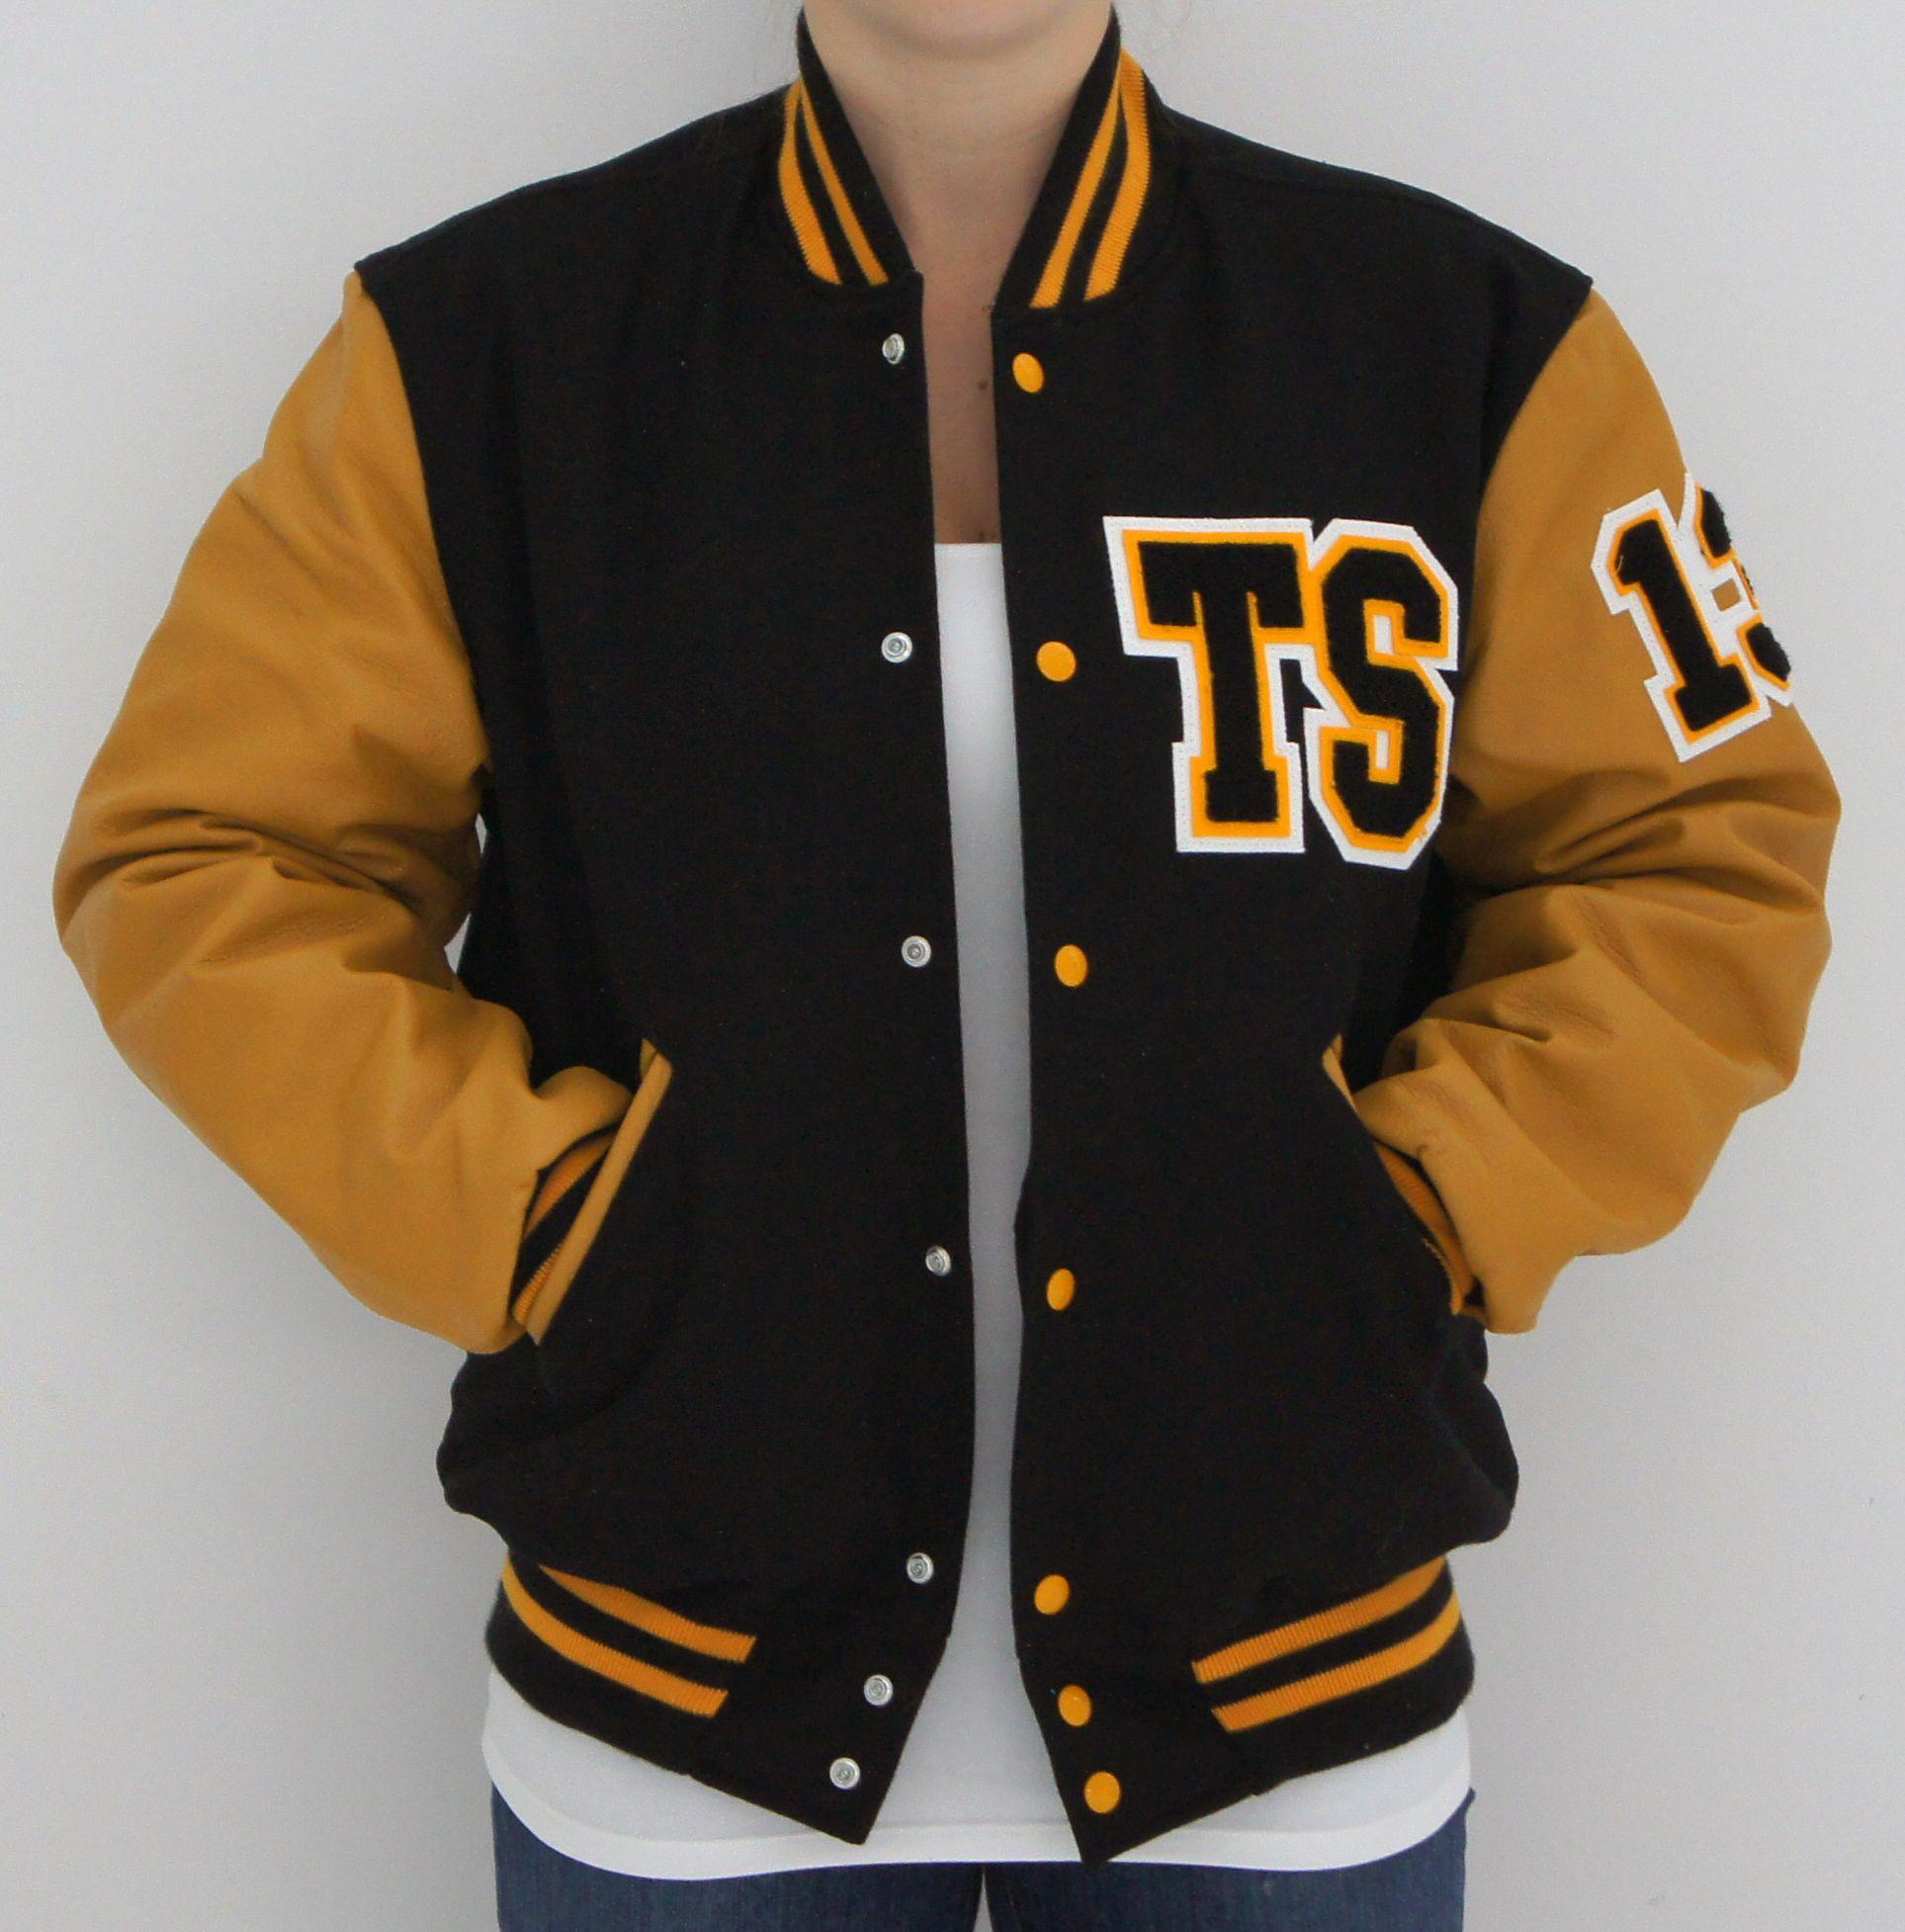 Black & Gold TS Letterman Tour Jacket: Taylor Swift Official Online Store